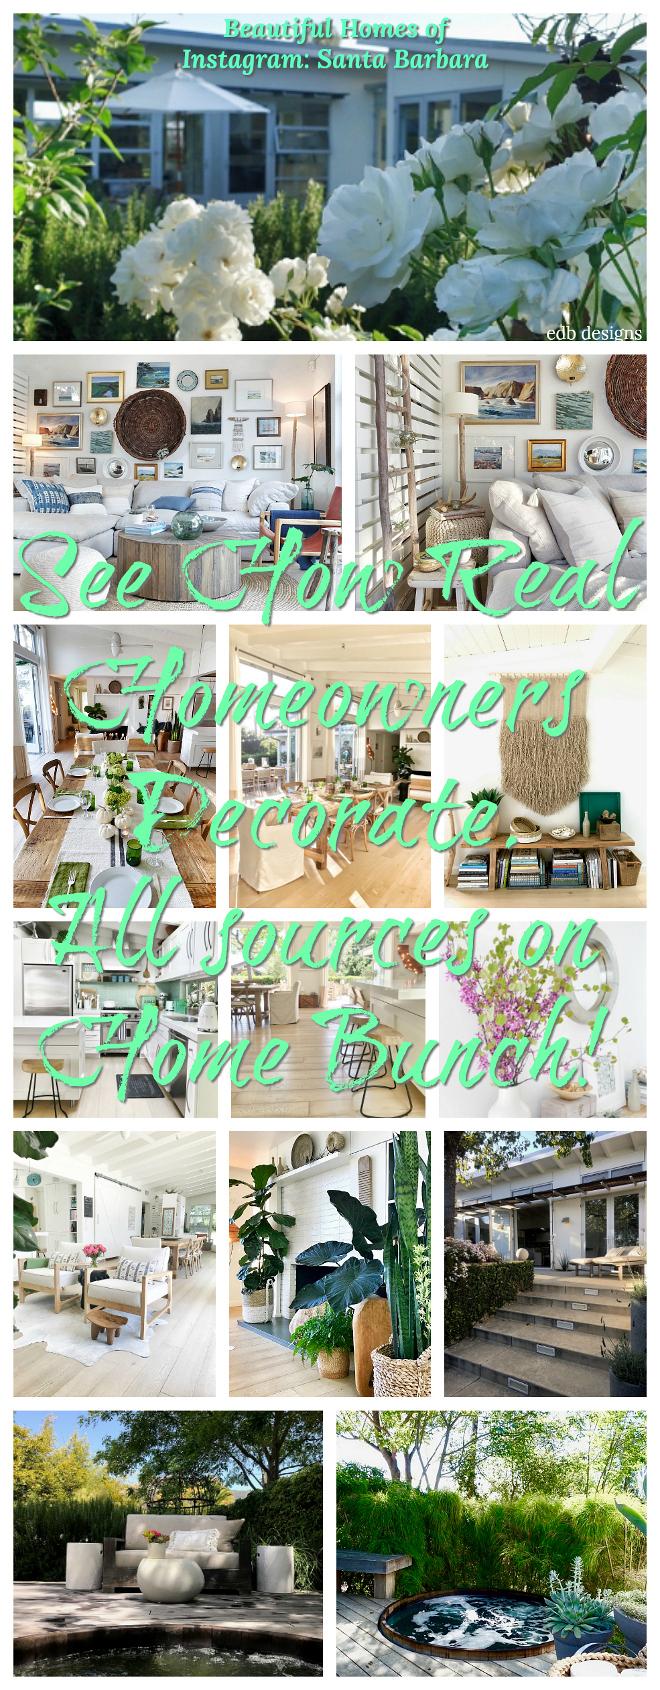 Beautiful Homes of Instagram Santa Barbara Home Bunch Blog series